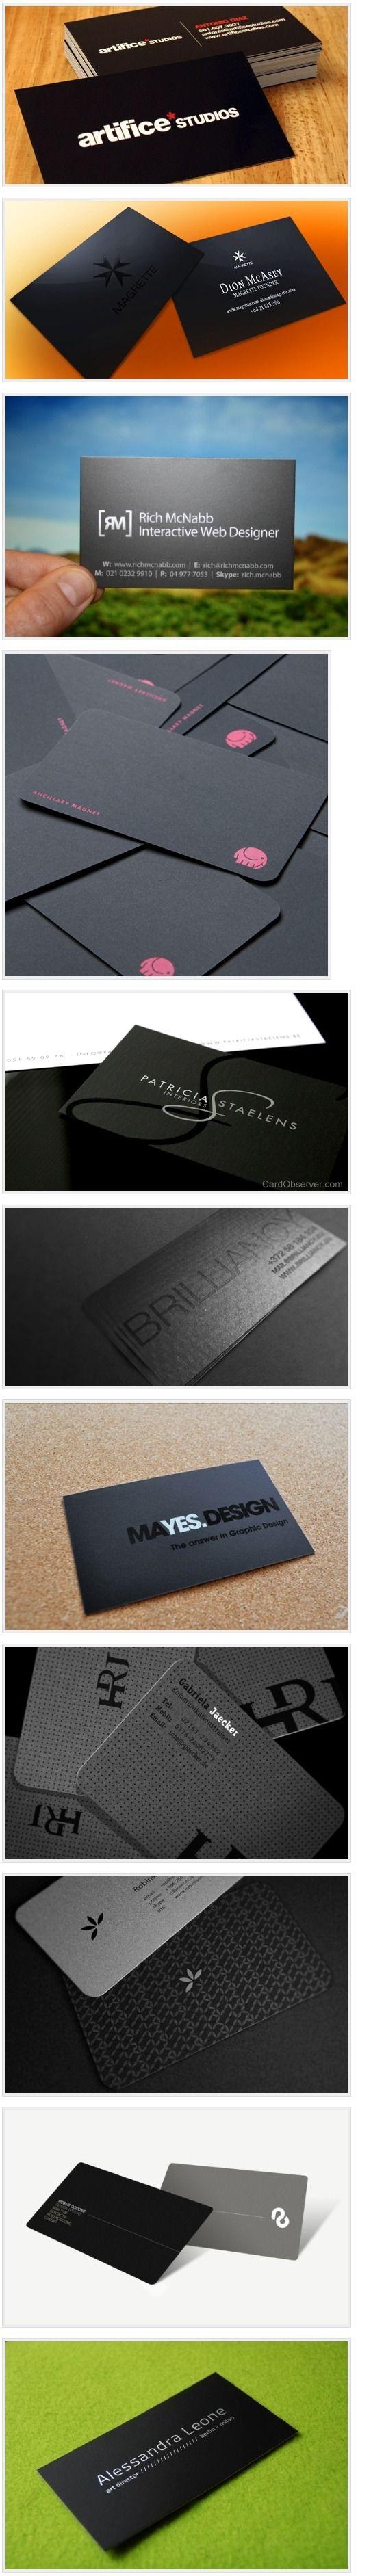 Auxo의 마이크로트렌드 ep2 :: 창의적인 명함디자인 70선 (Creative Business Card)